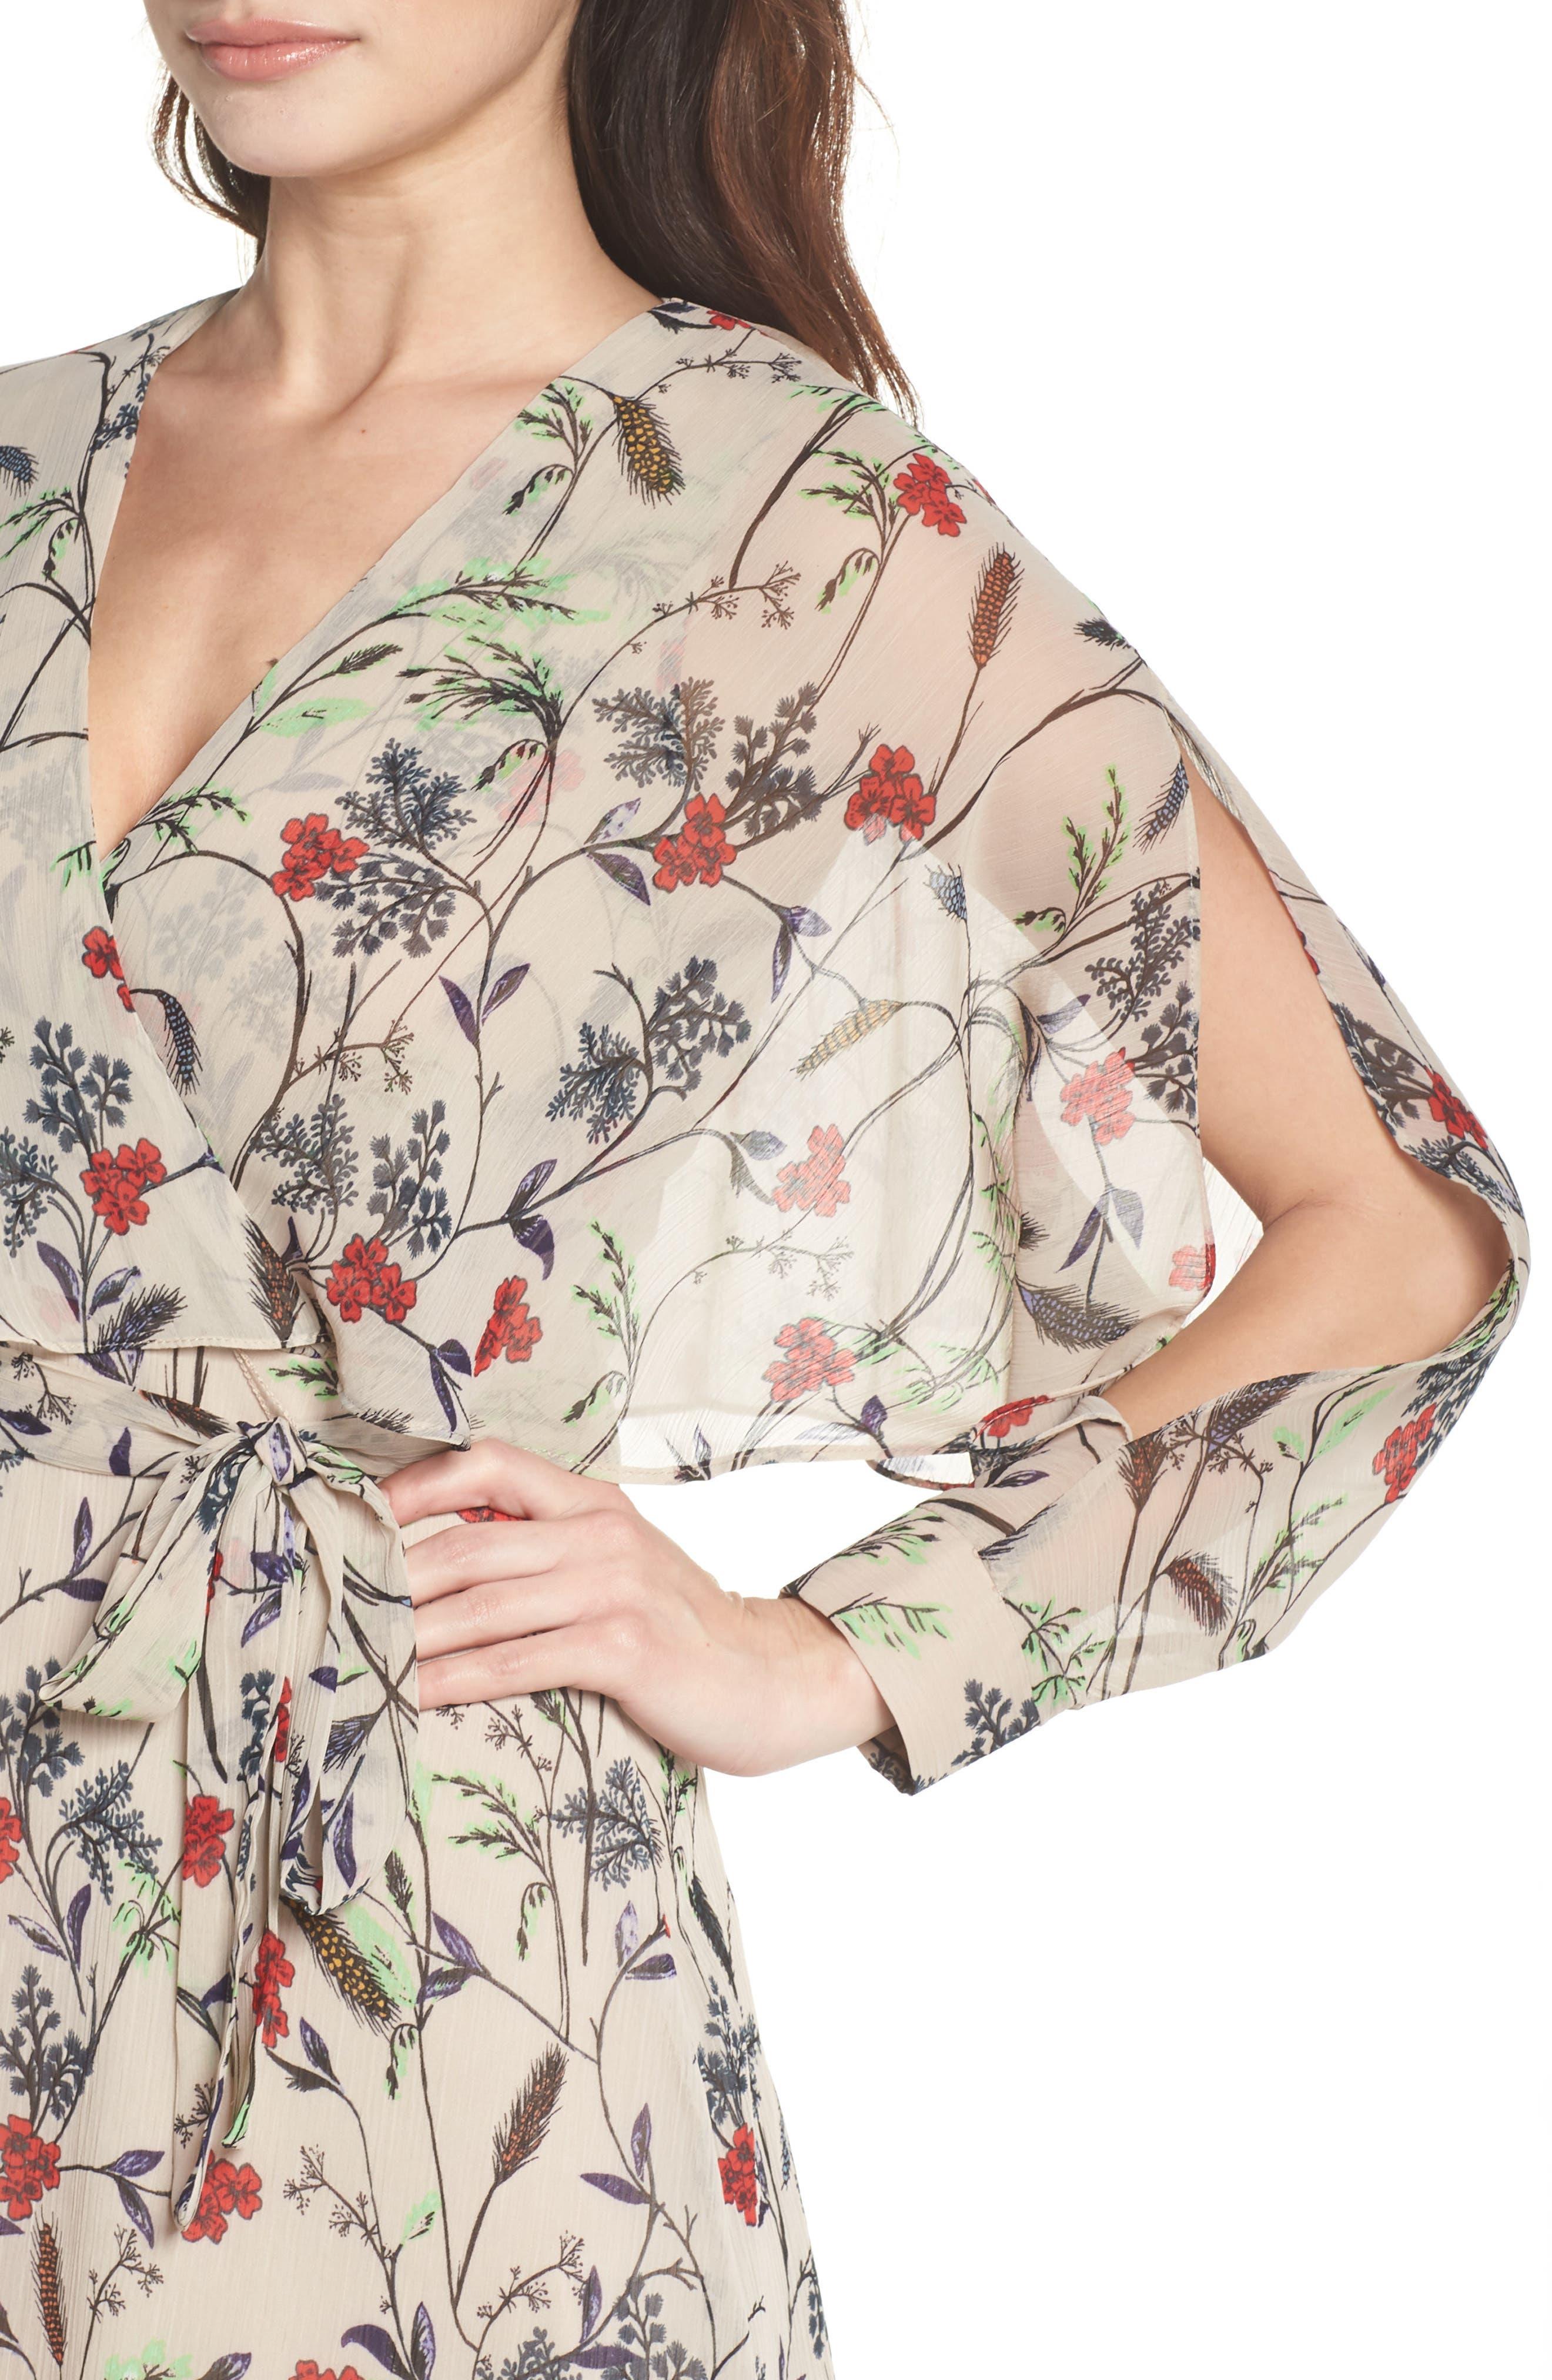 Yoryu Floral Chiffon Dress,                             Alternate thumbnail 4, color,                             280